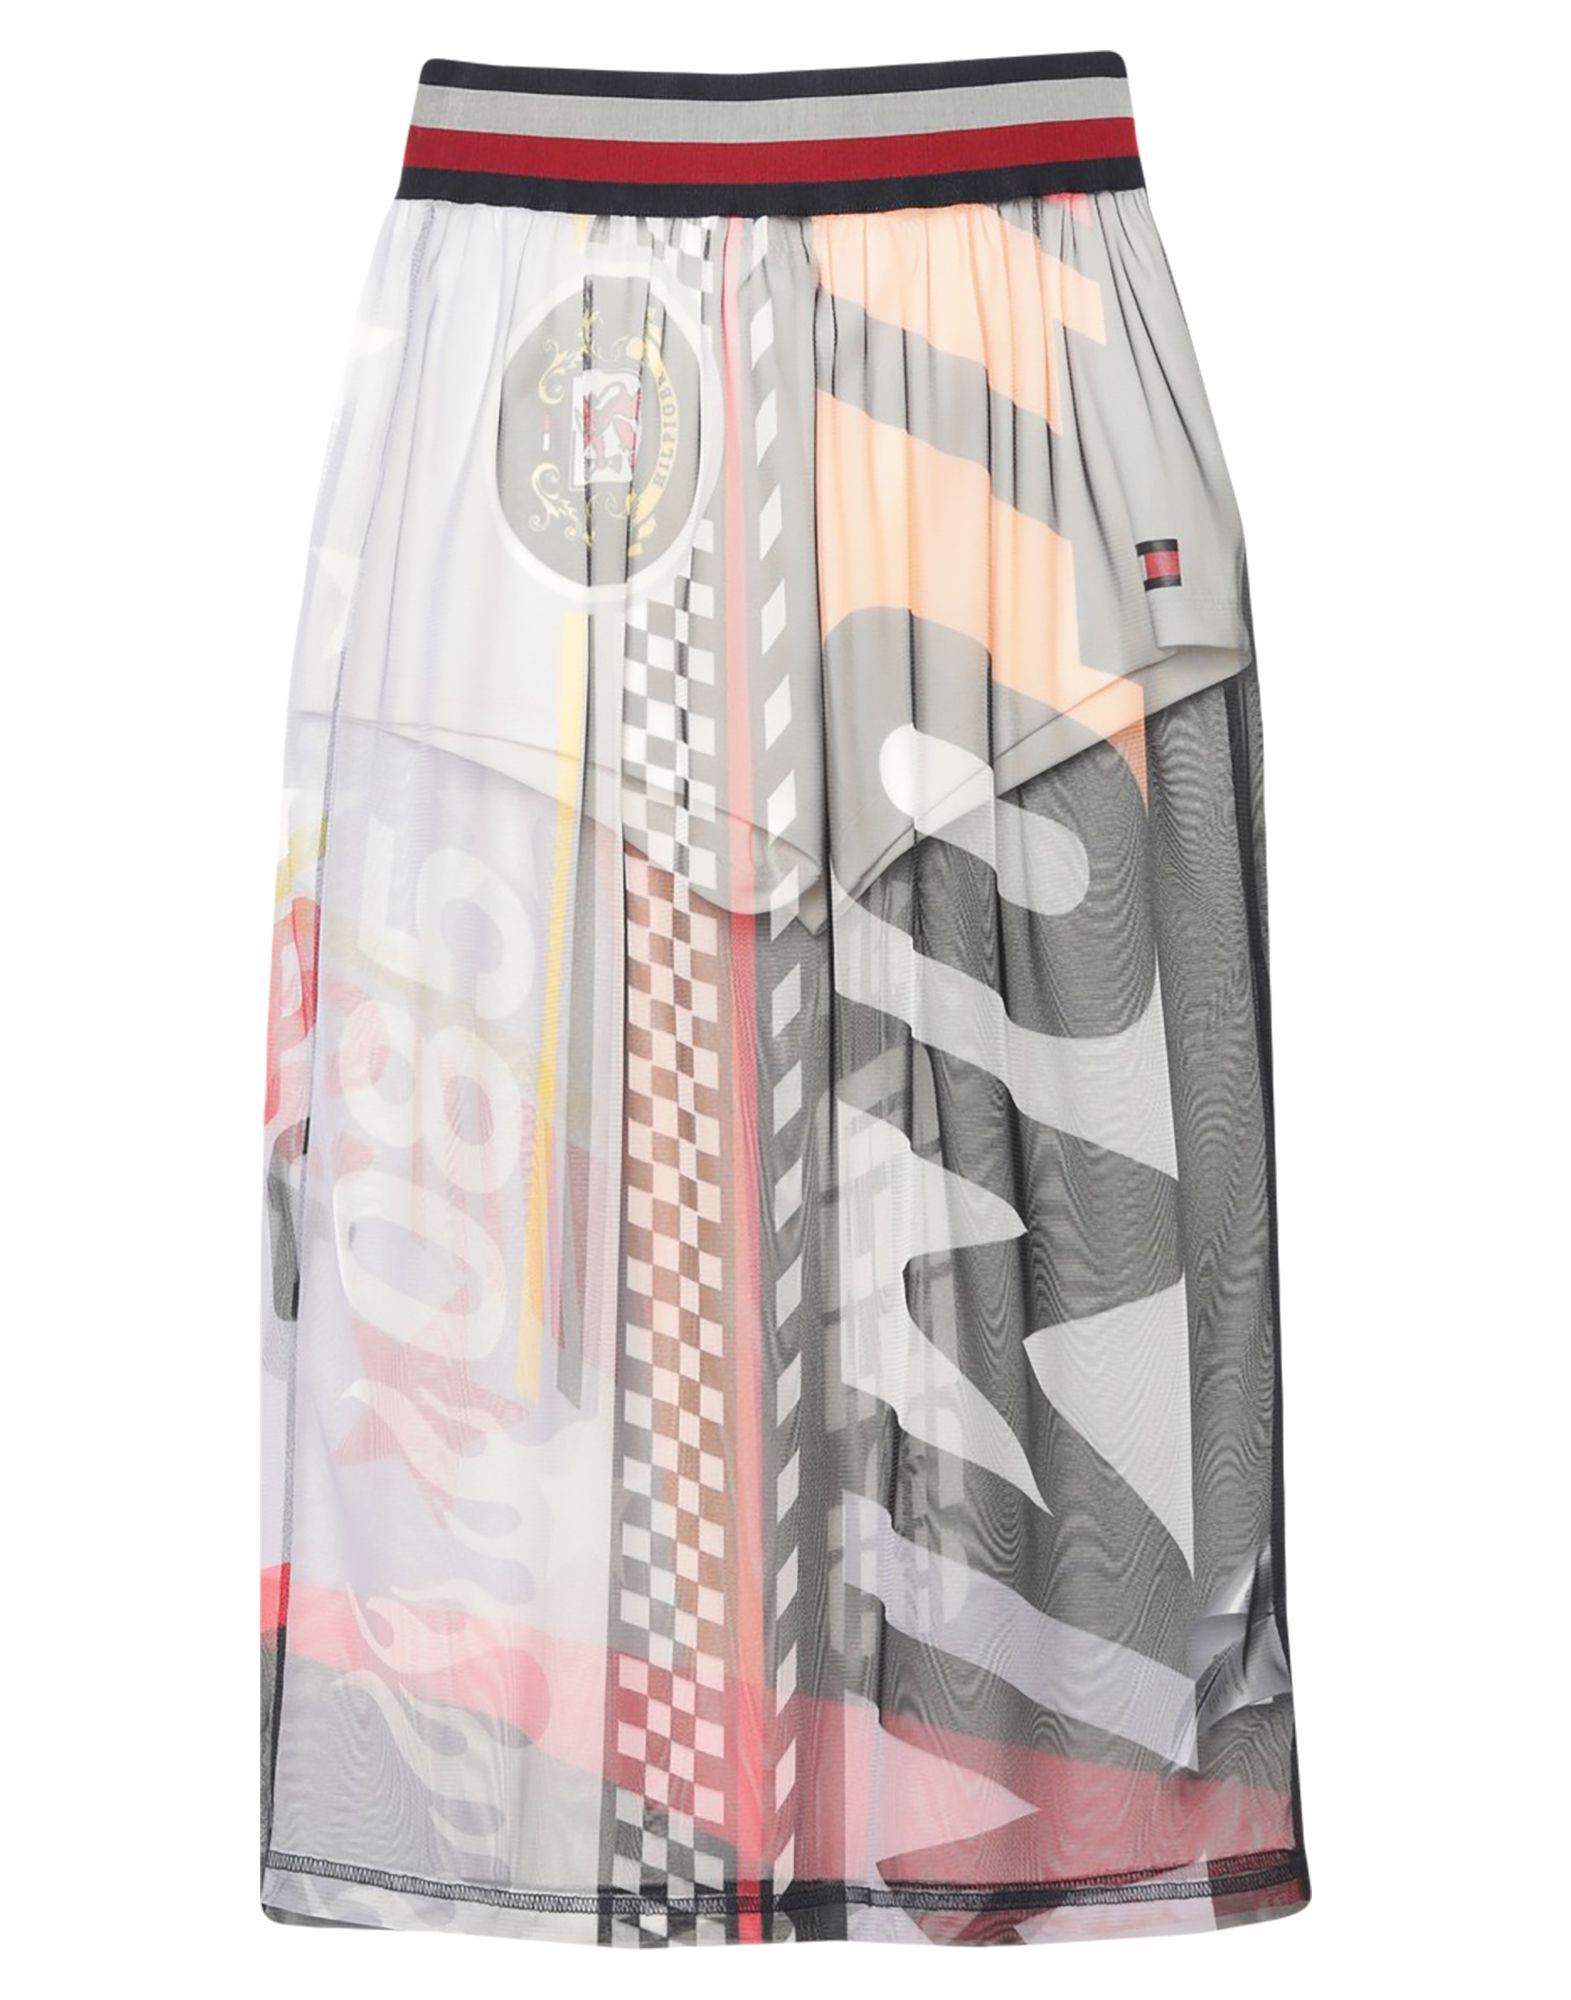 Фото - HILFIGER COLLECTION Юбка длиной 3/4 hilfiger collection юбка длиной 3 4